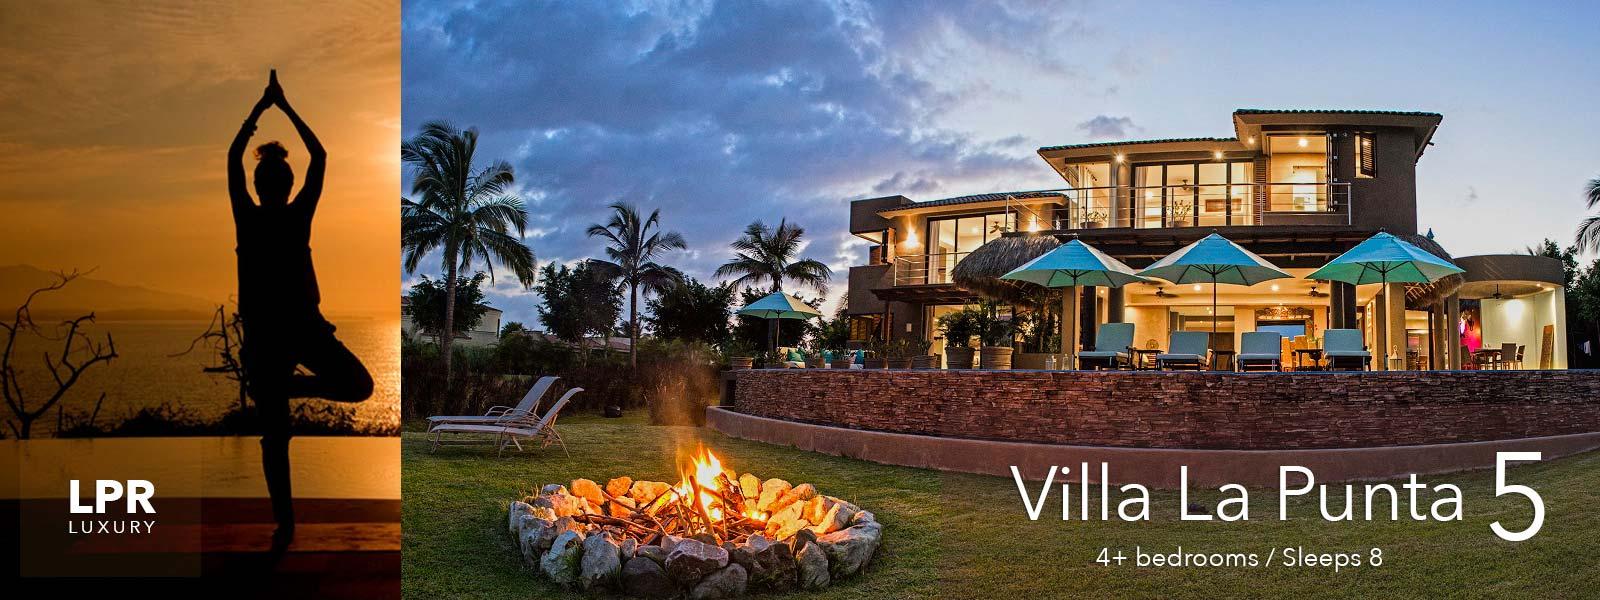 Villa la Punta 5 - La Punta Estate - Punta Mita Resort - Riviera Nayarit - Mexico